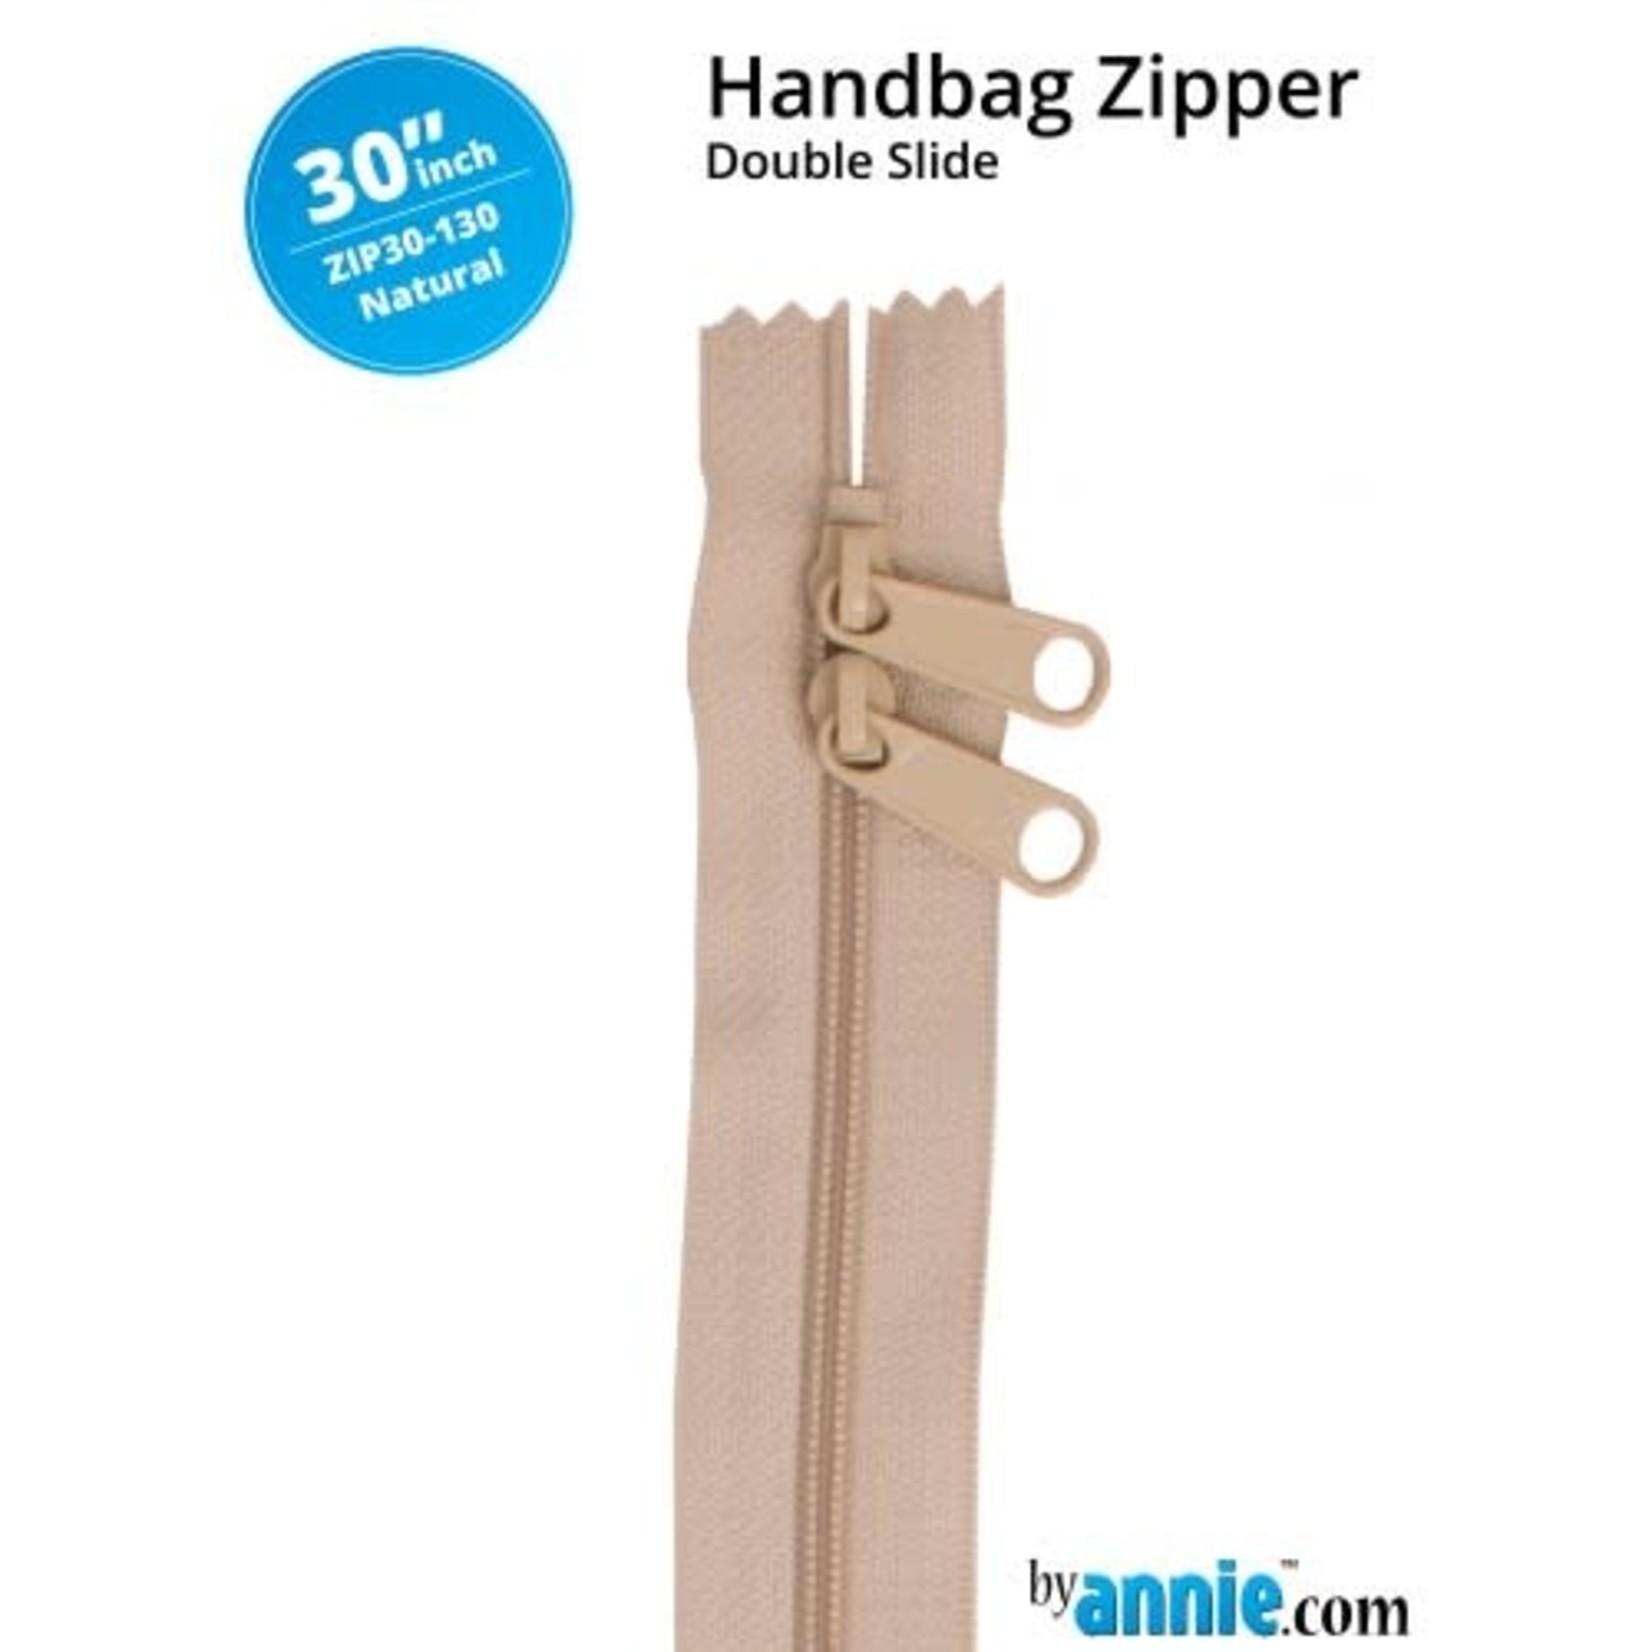 "BY ANNIE Double Slide Handbag Zipper 30"" Neutrals"